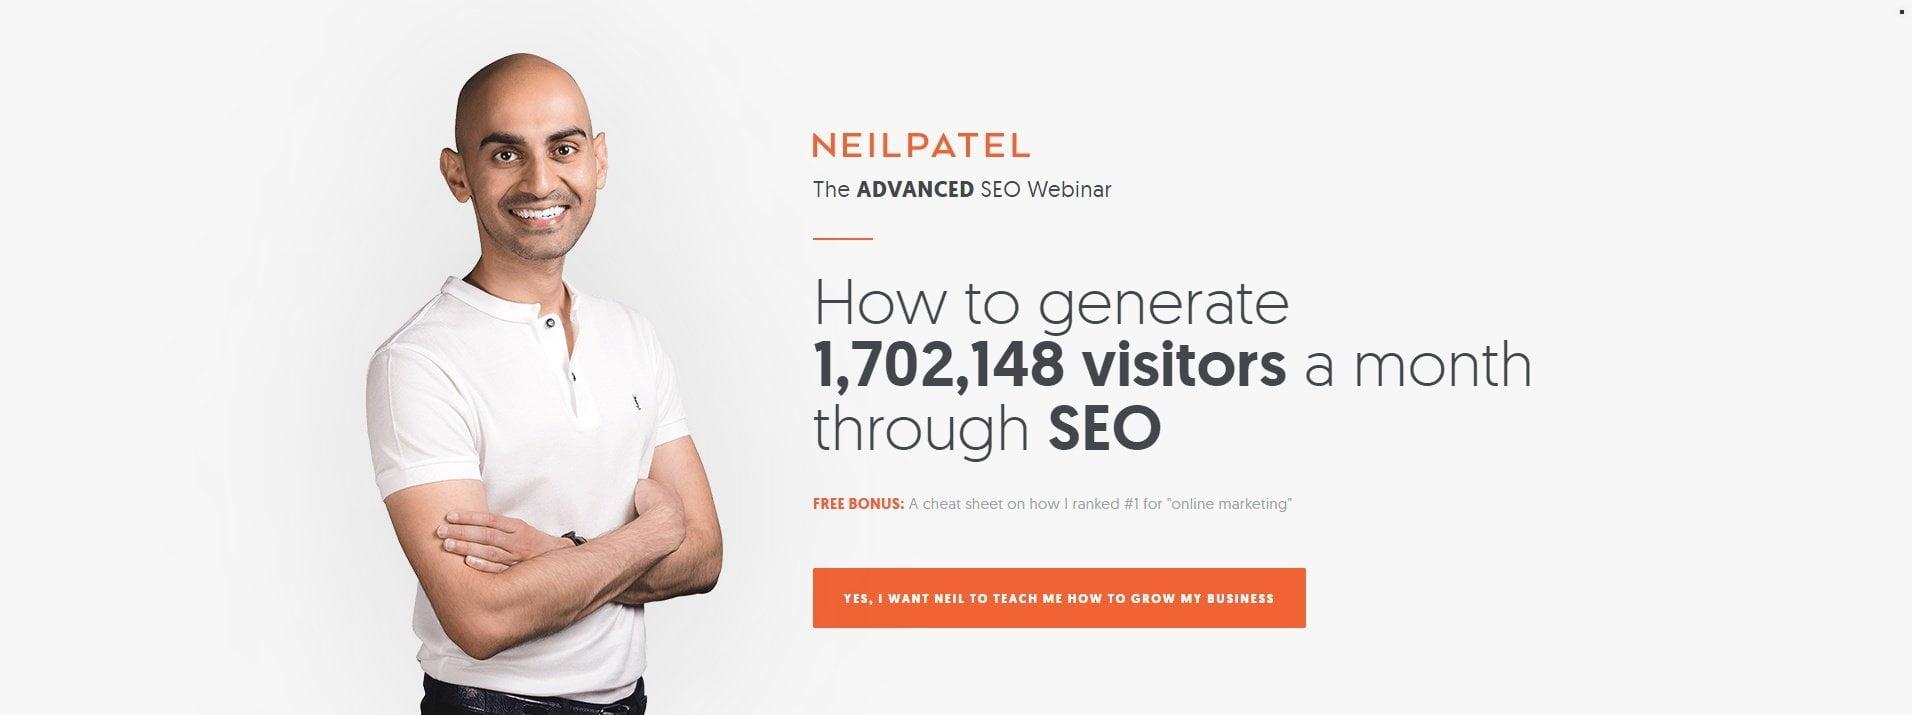 Neil Patel headline example